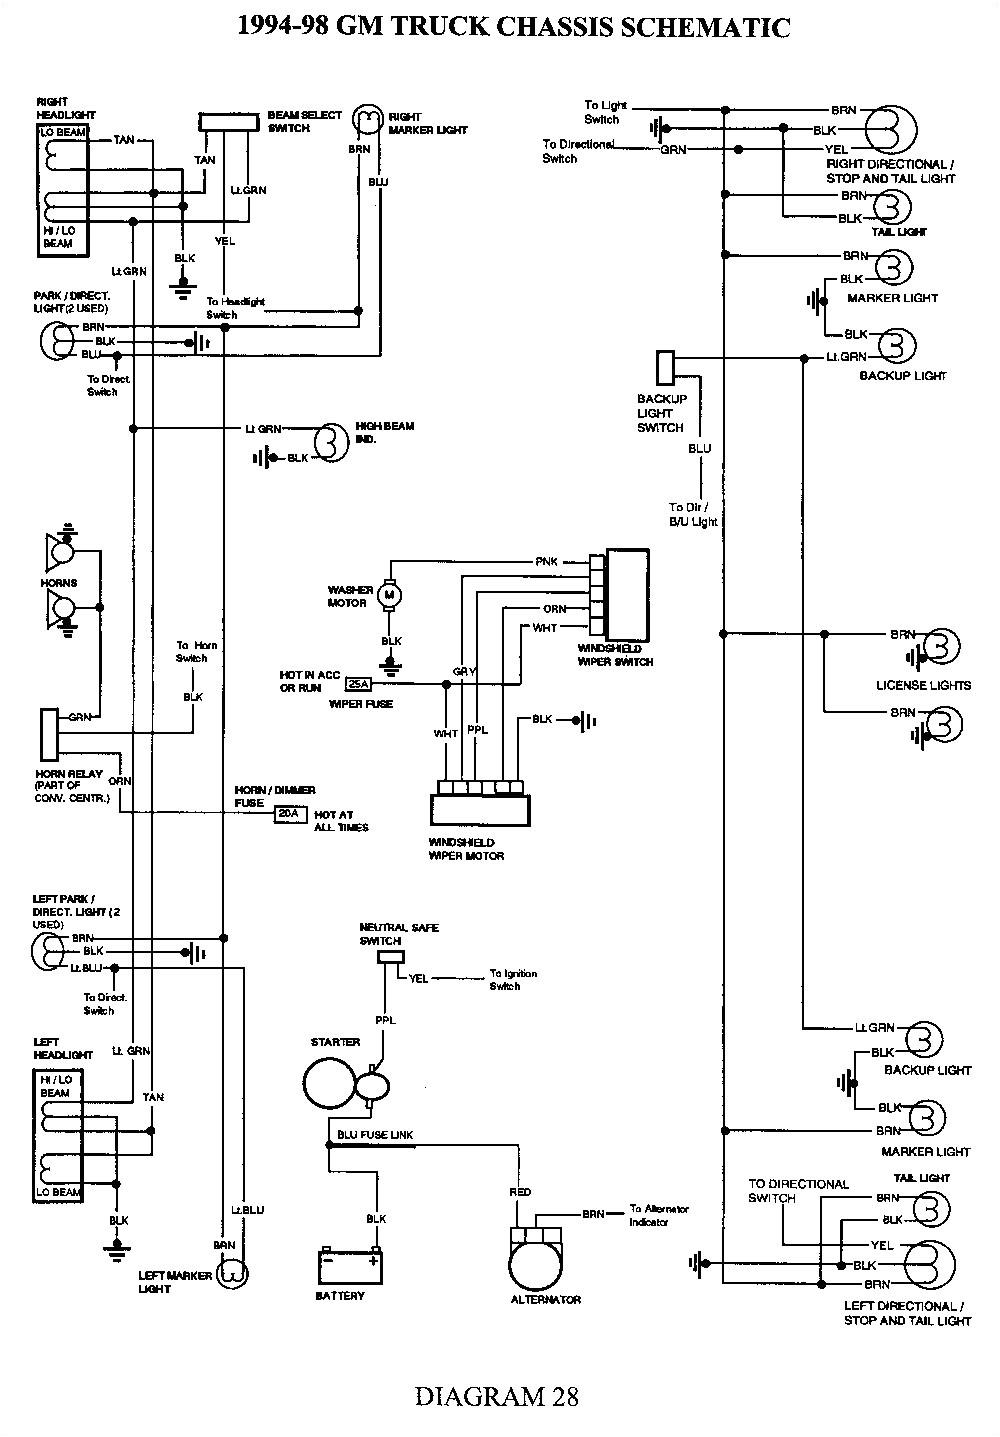 1982 p30 wiring diagram wiring diagram go 1994 p30 7 4 wiring diagram